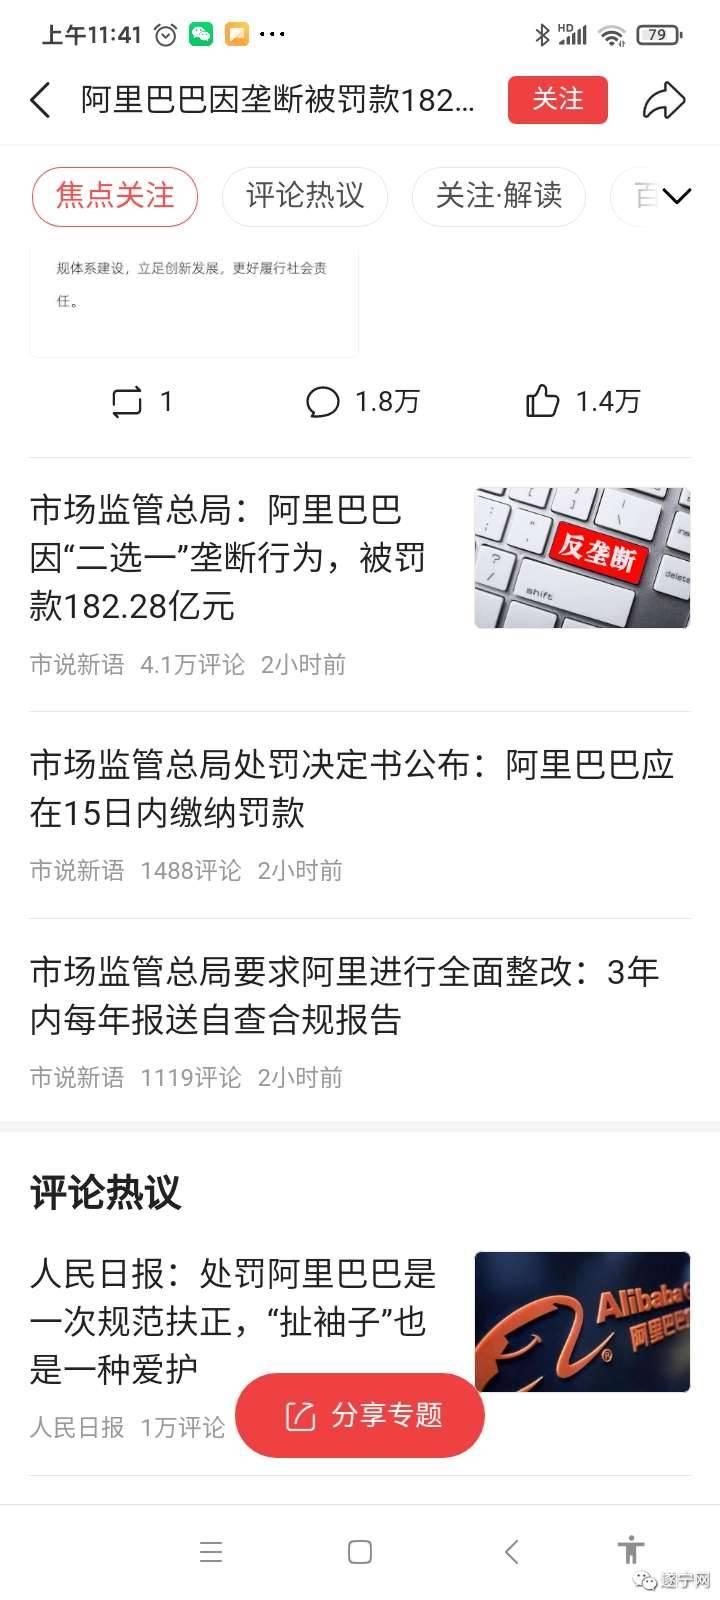 Screenshot_2021-04-10-11-41-15-807_com.ss.android.article.lite.jpg